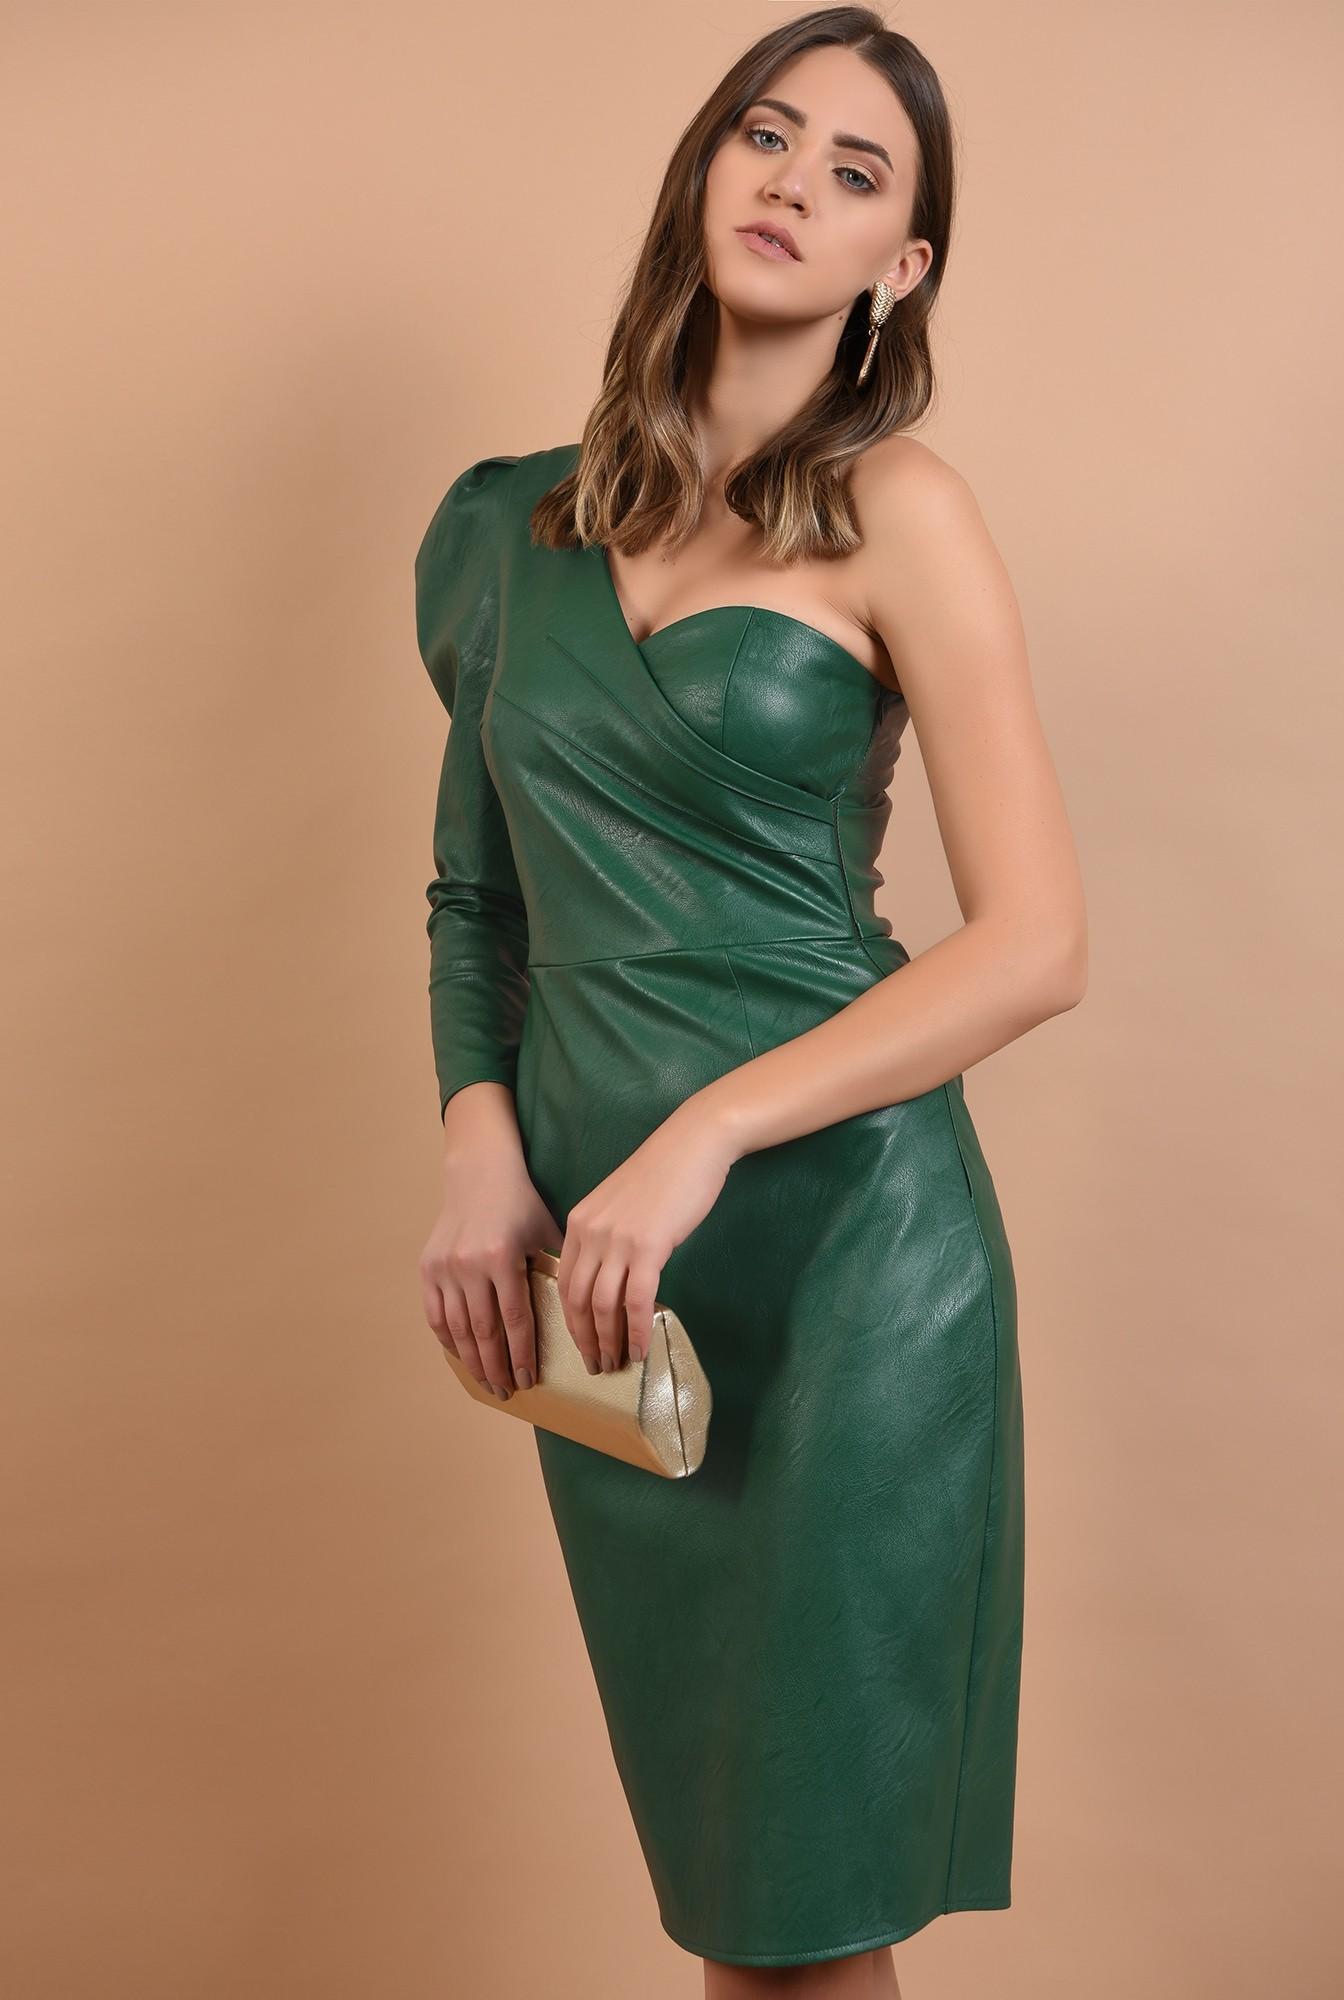 0 - 360 - rochie midi, conica, umar gol, piele ecologica